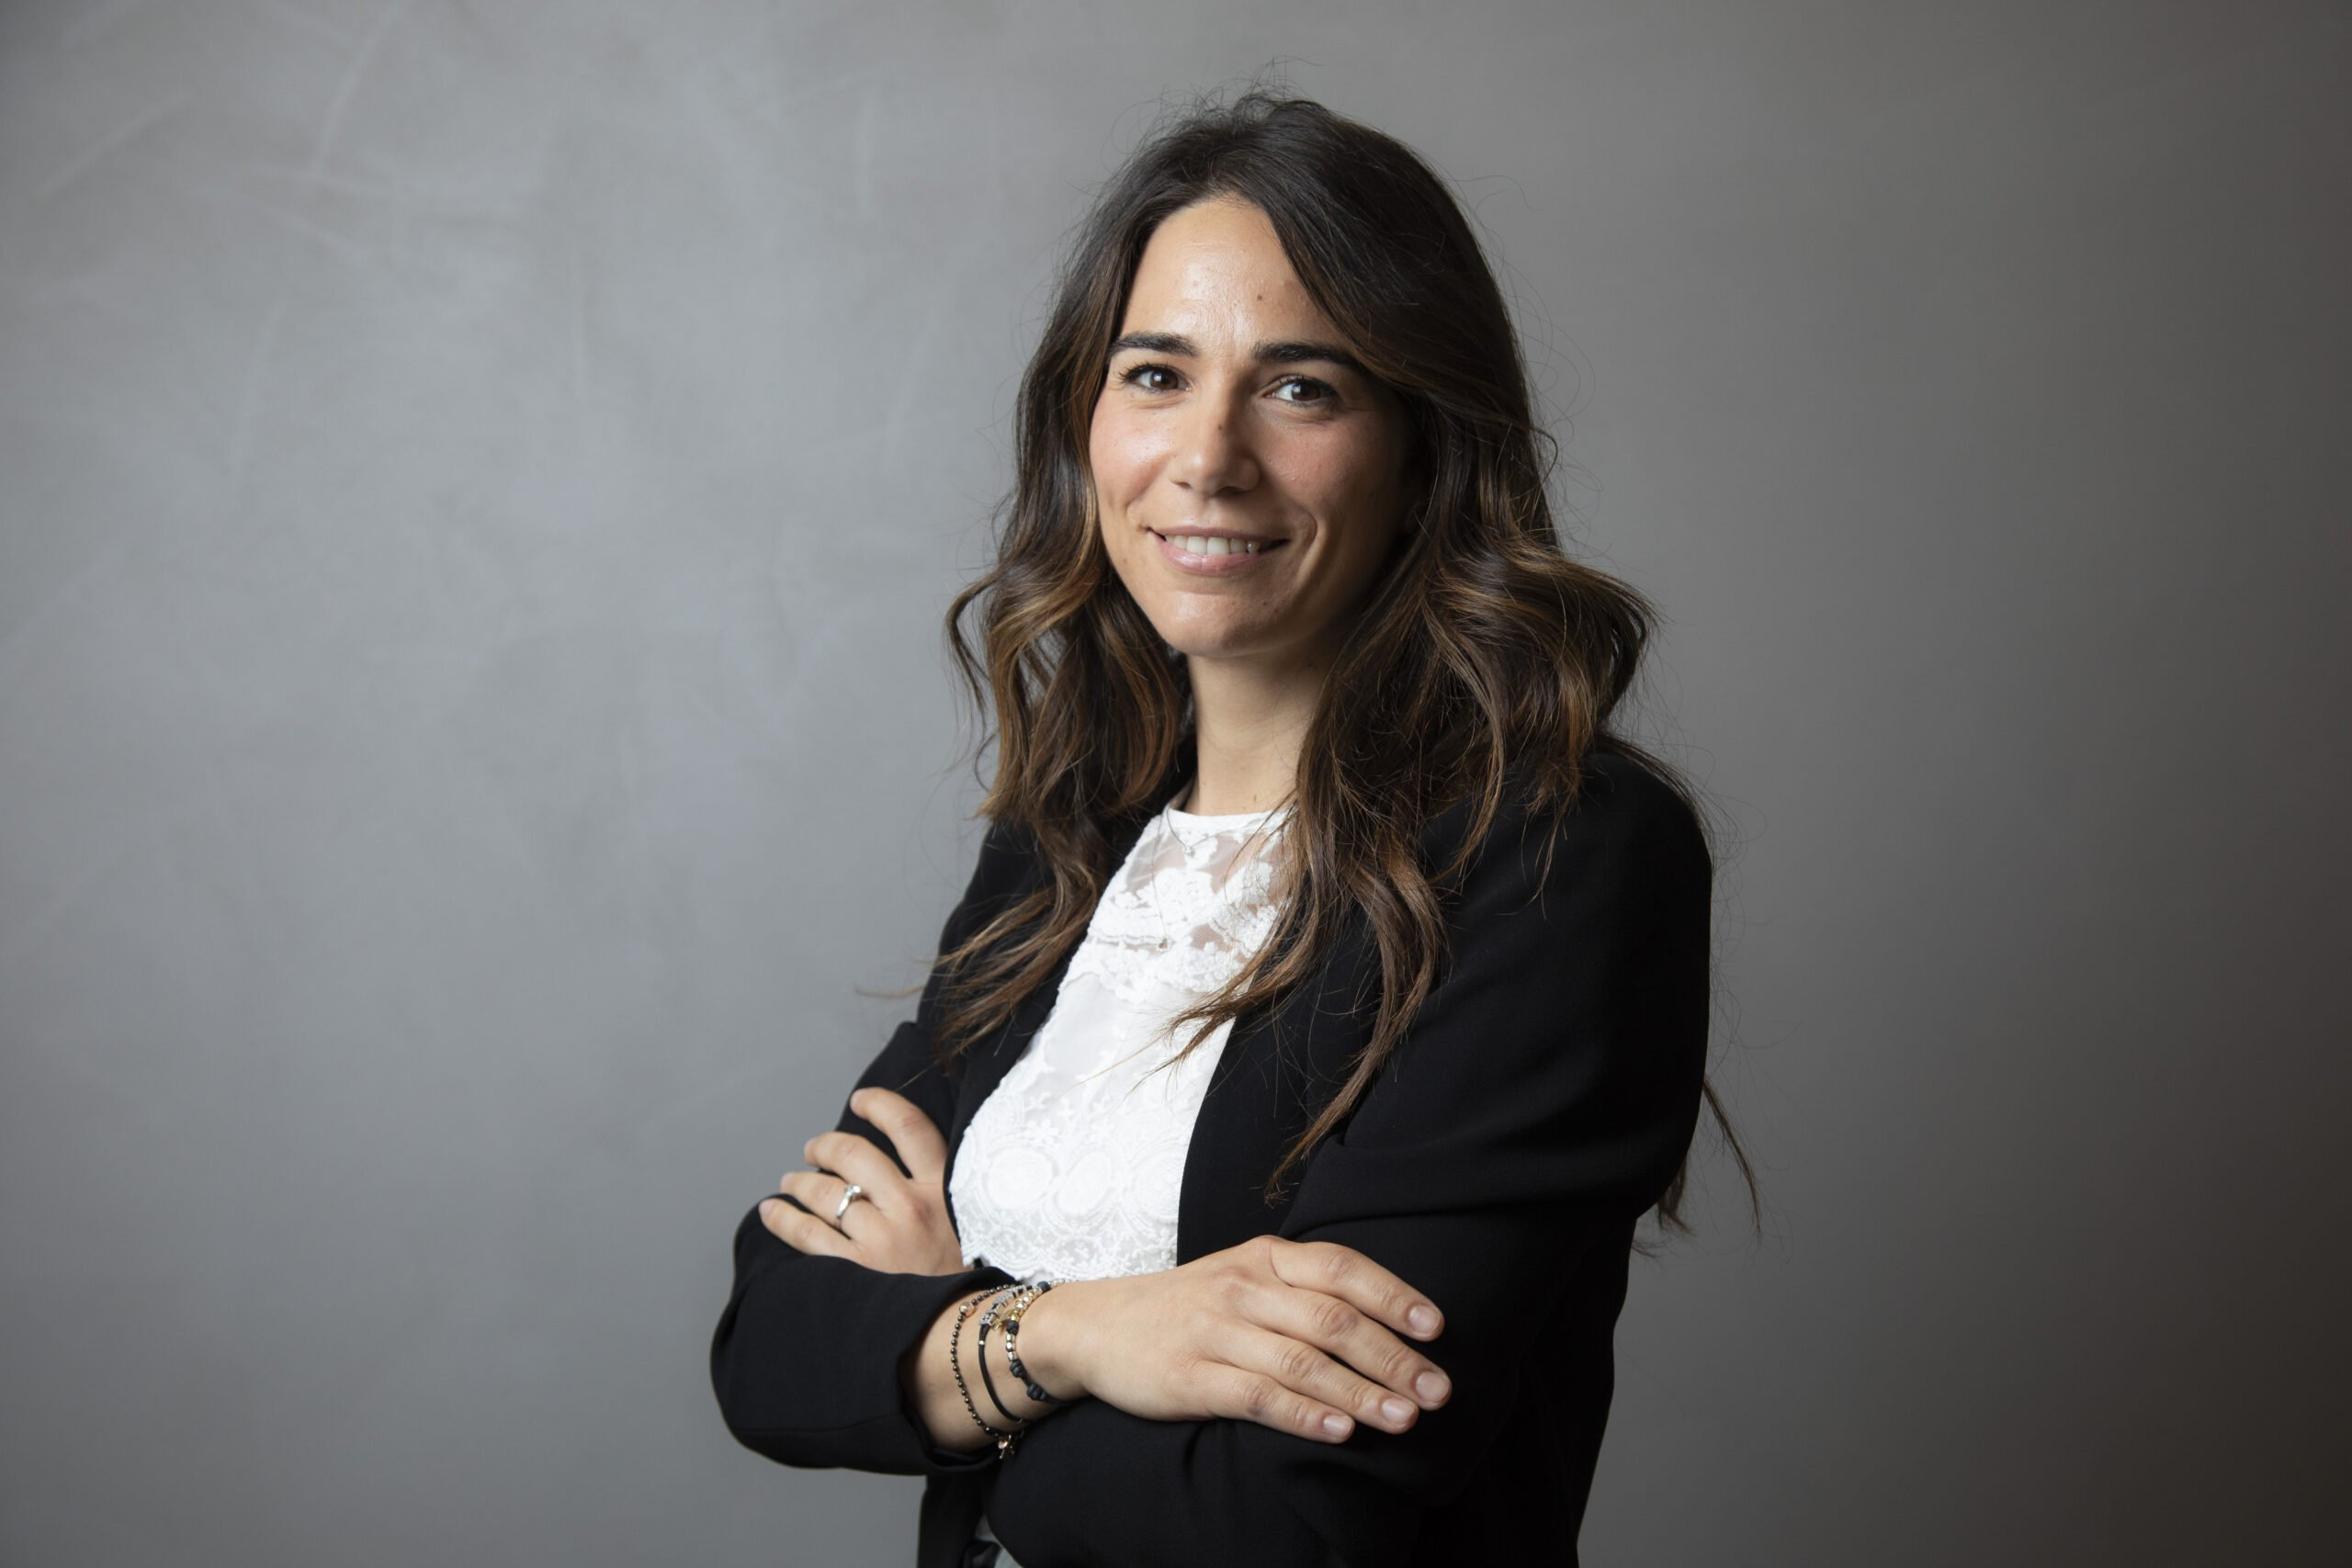 Dott.ssa Elisa Cattiodoro